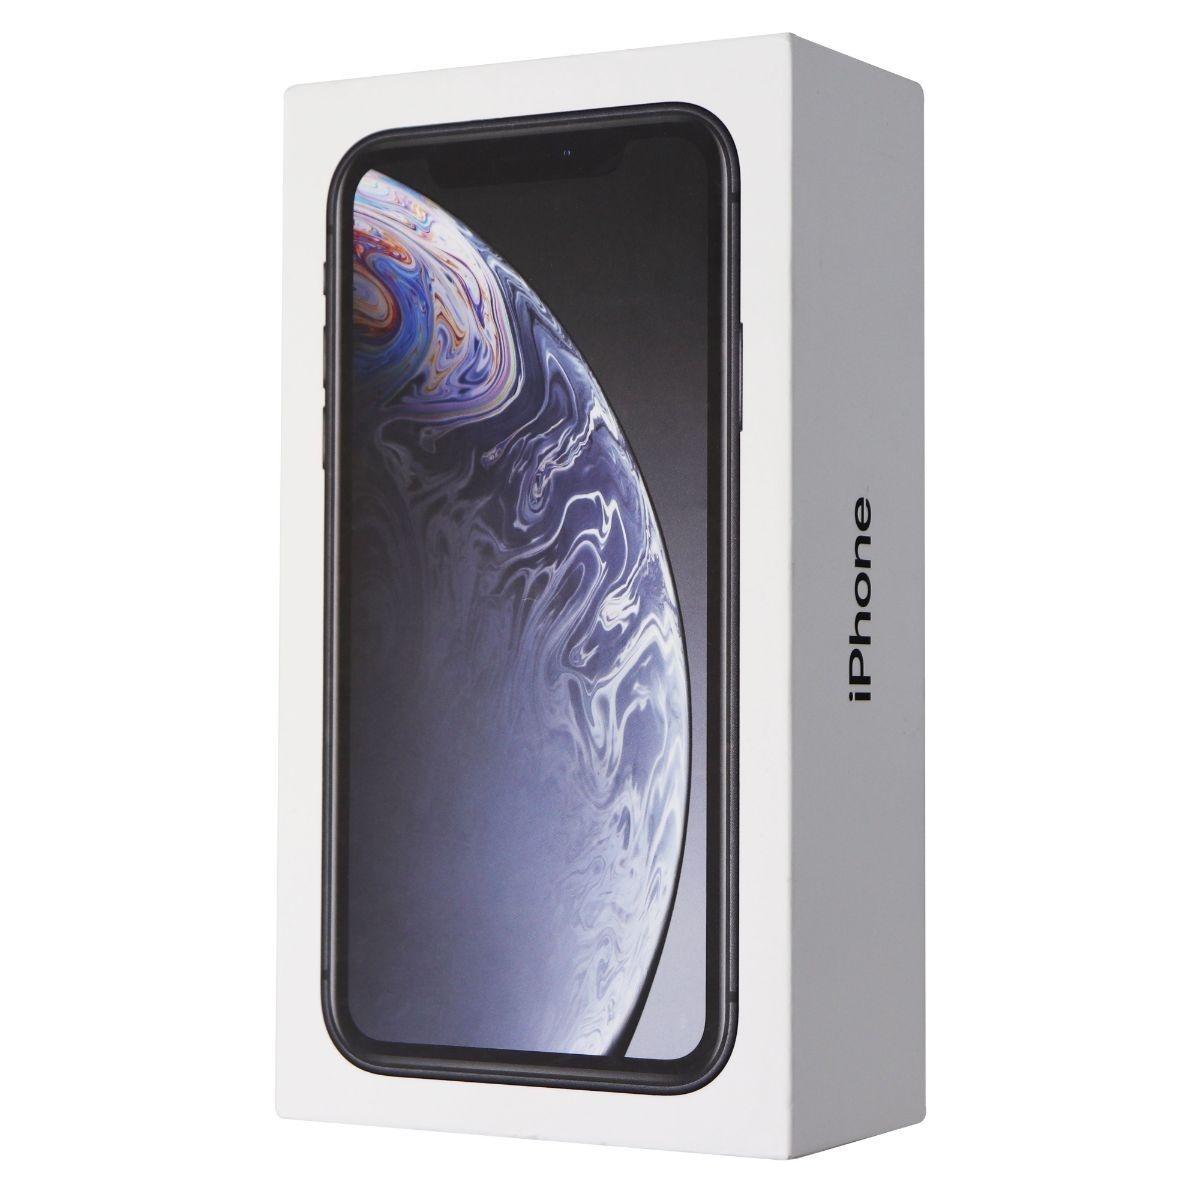 RETAIL BOX - Apple iPhone XR - 128GB / Black - NO DEVICE